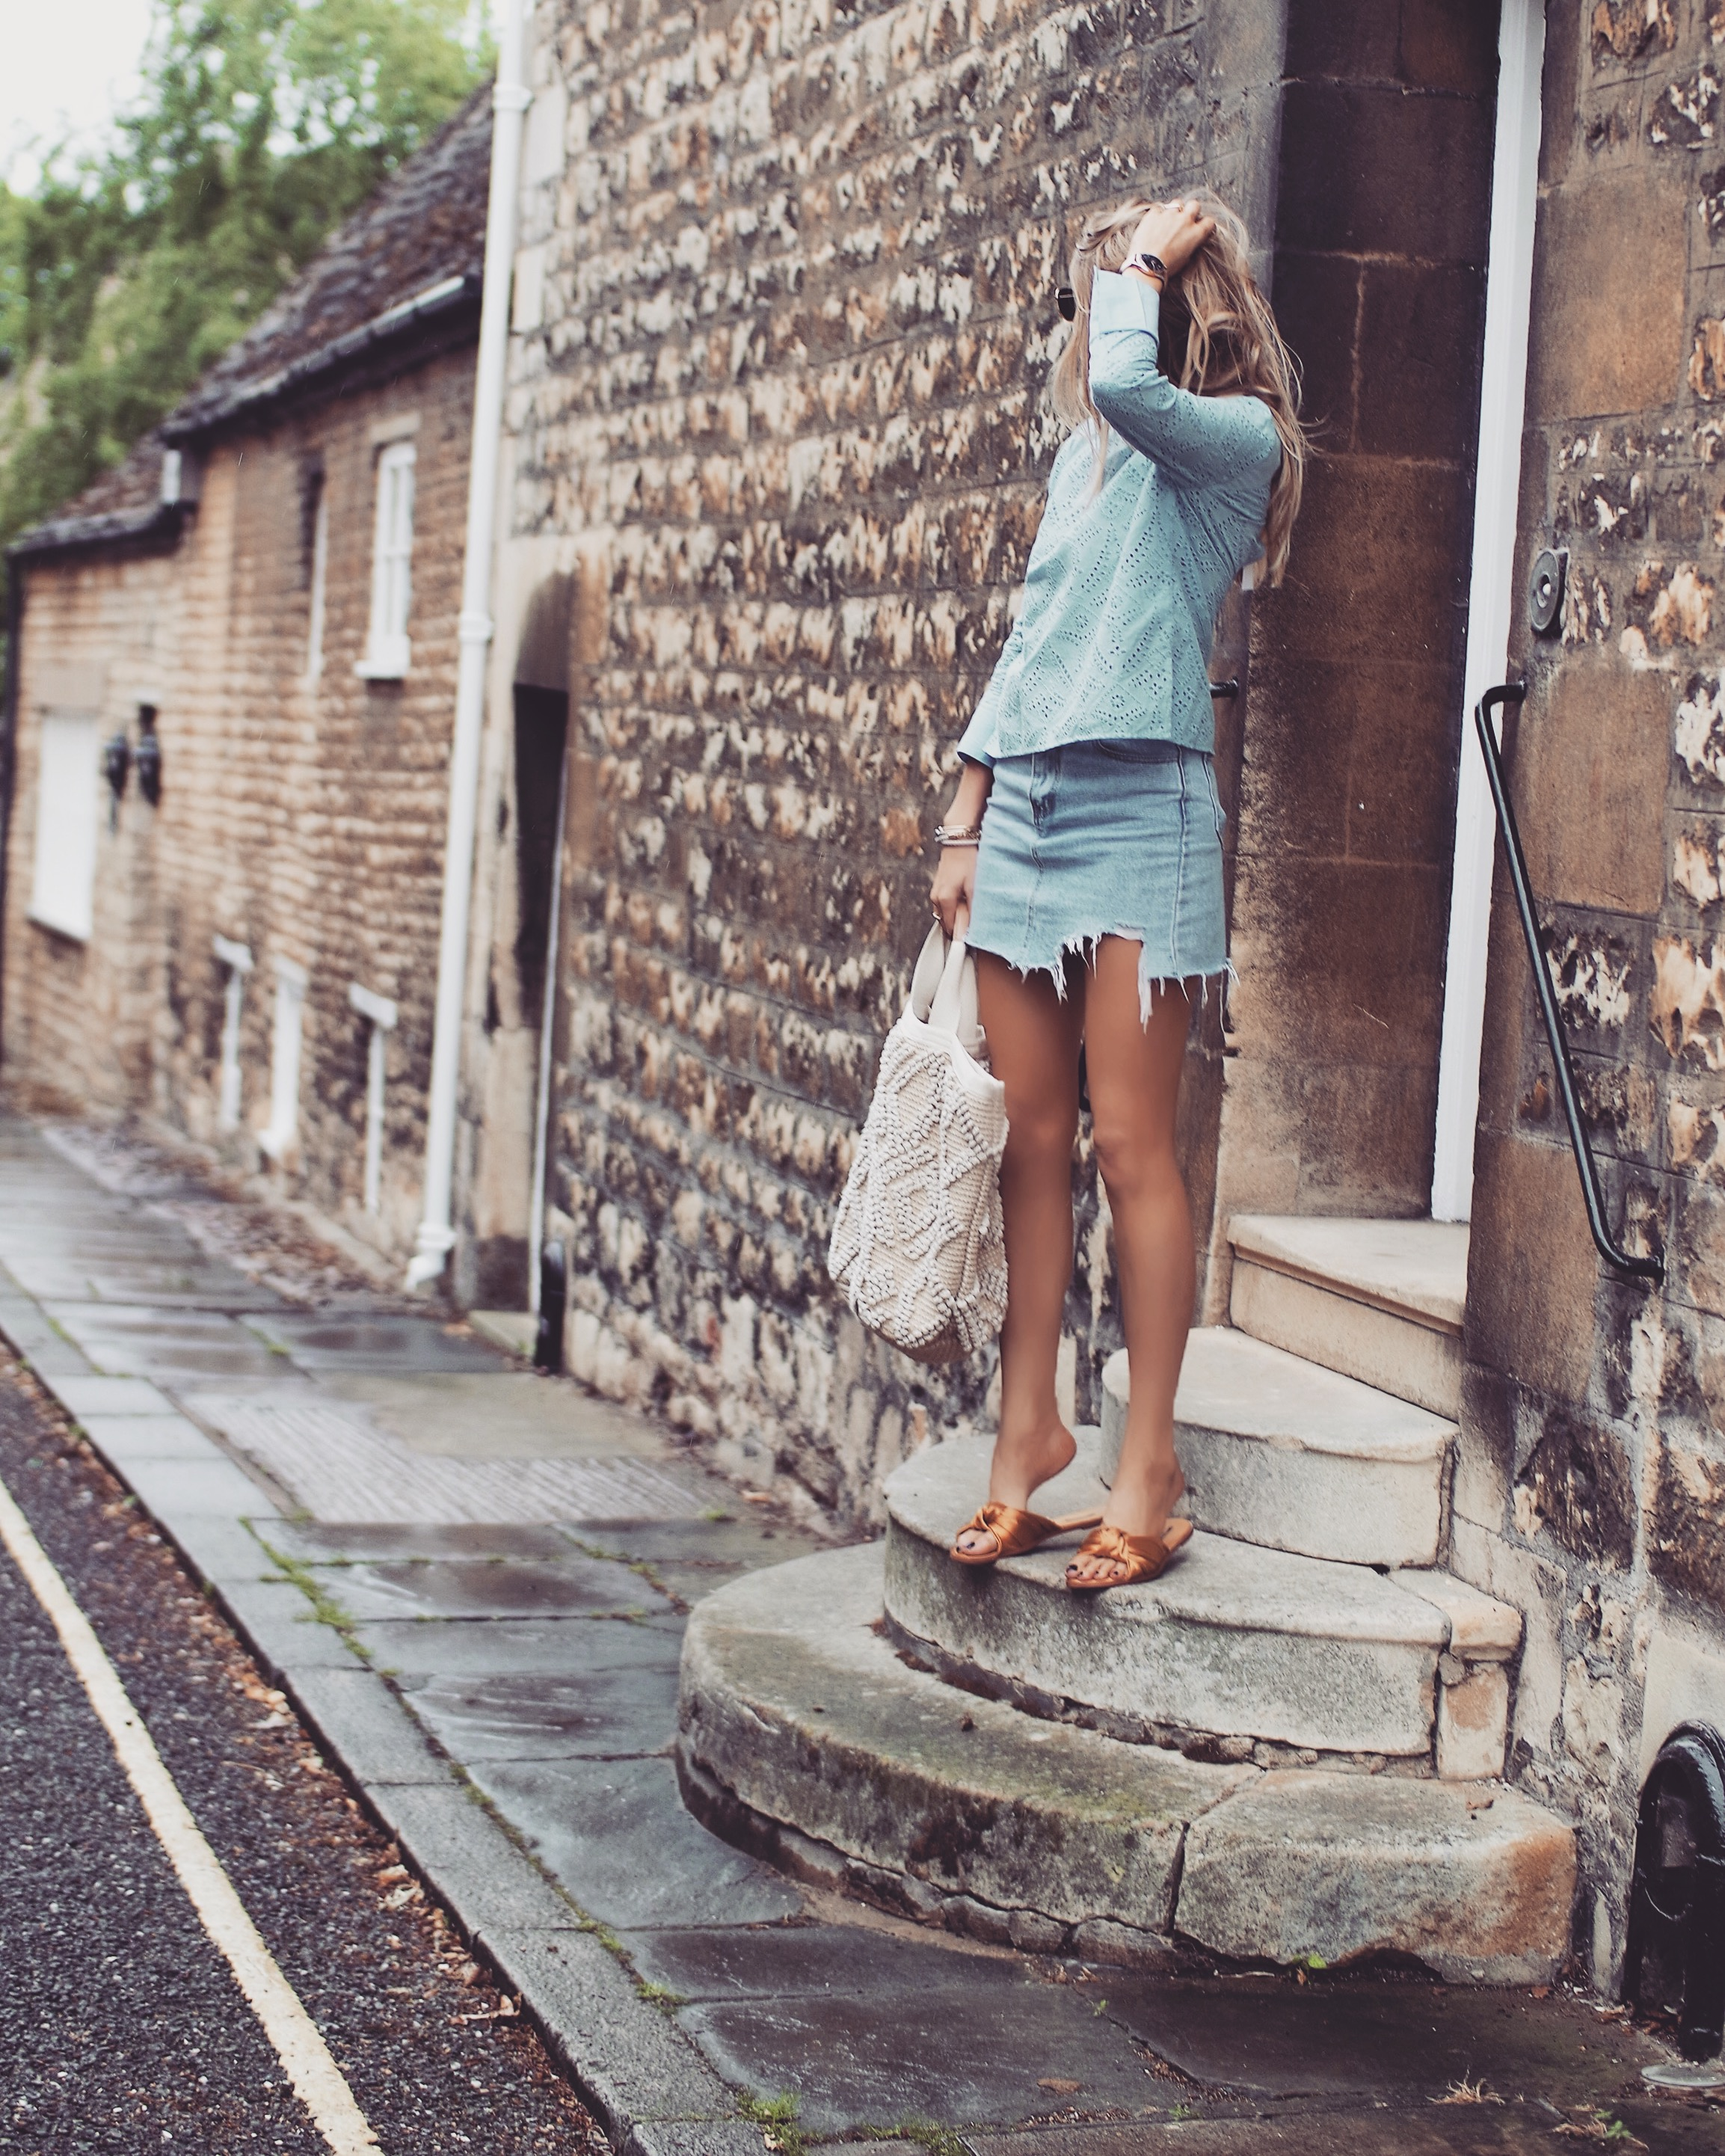 Basket Bag Fashion Blogger Street Style Love Style Mindfulness Fashion Personal Style Blog